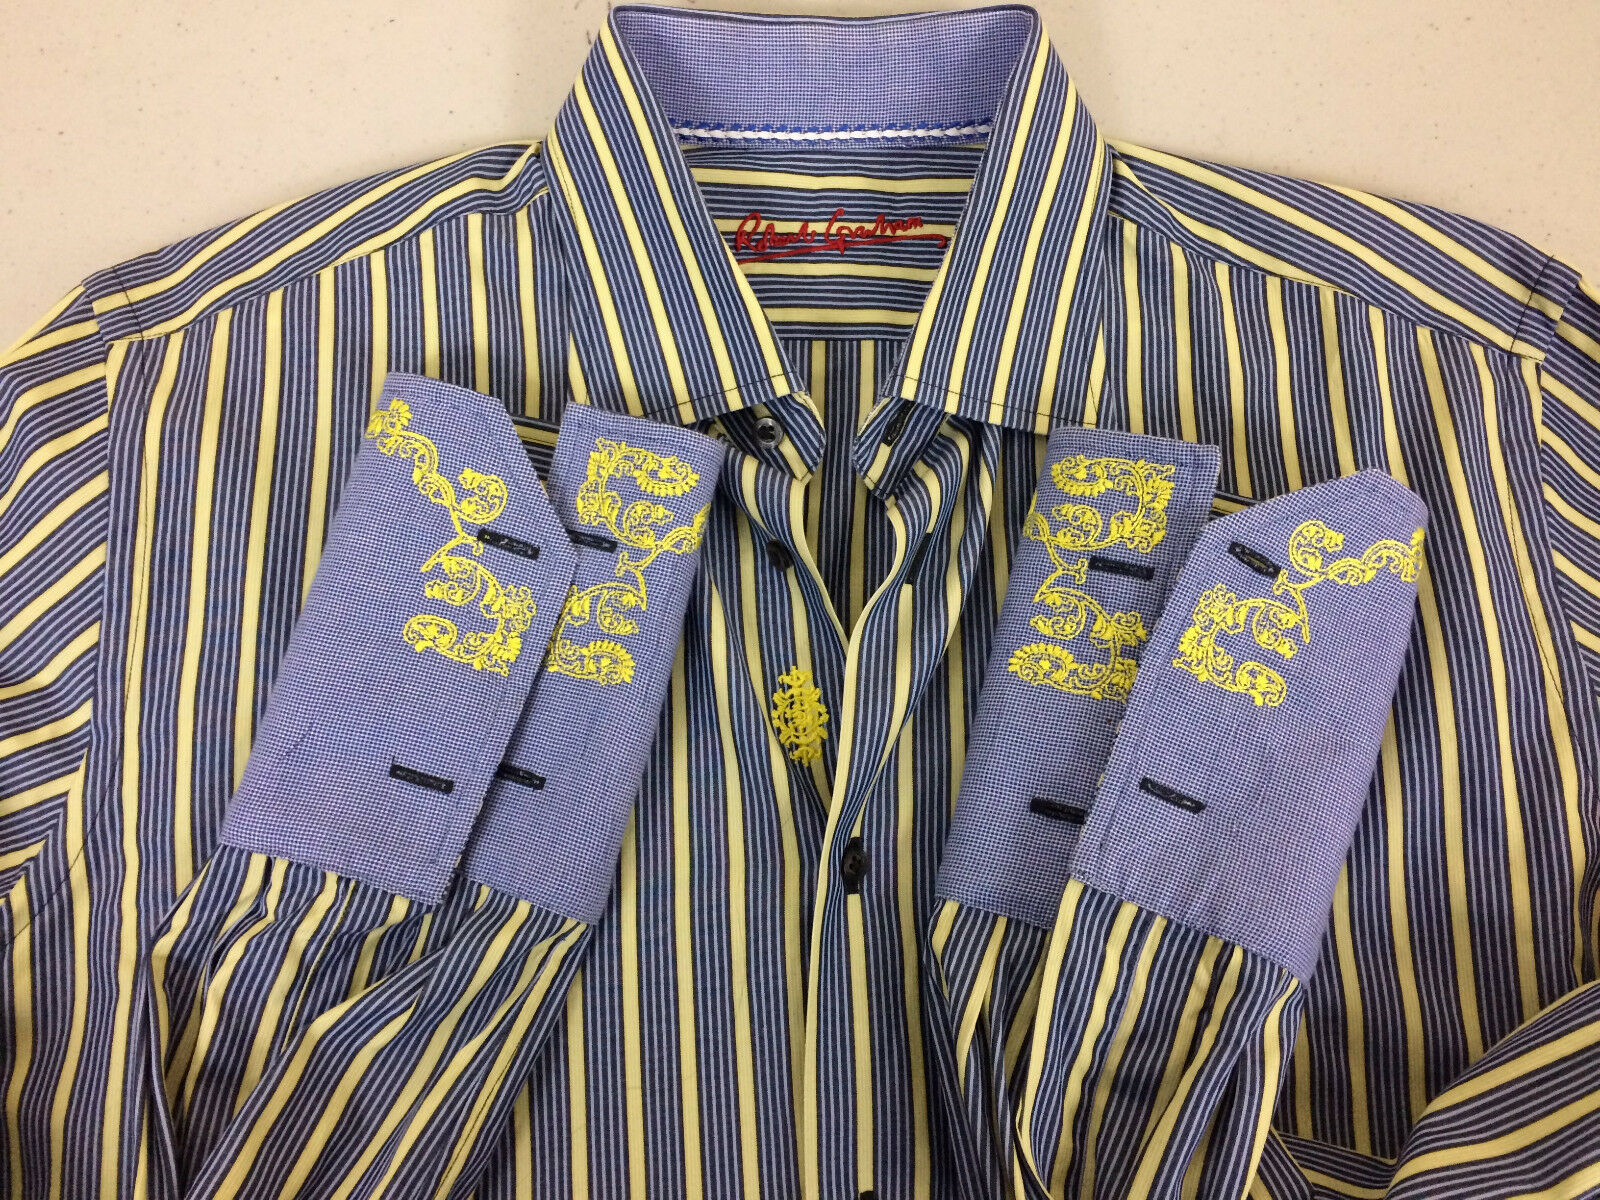 Robert Graham Men Dress Shirt Size 16 1 2 Multi-color Stripes - Very Good Cond